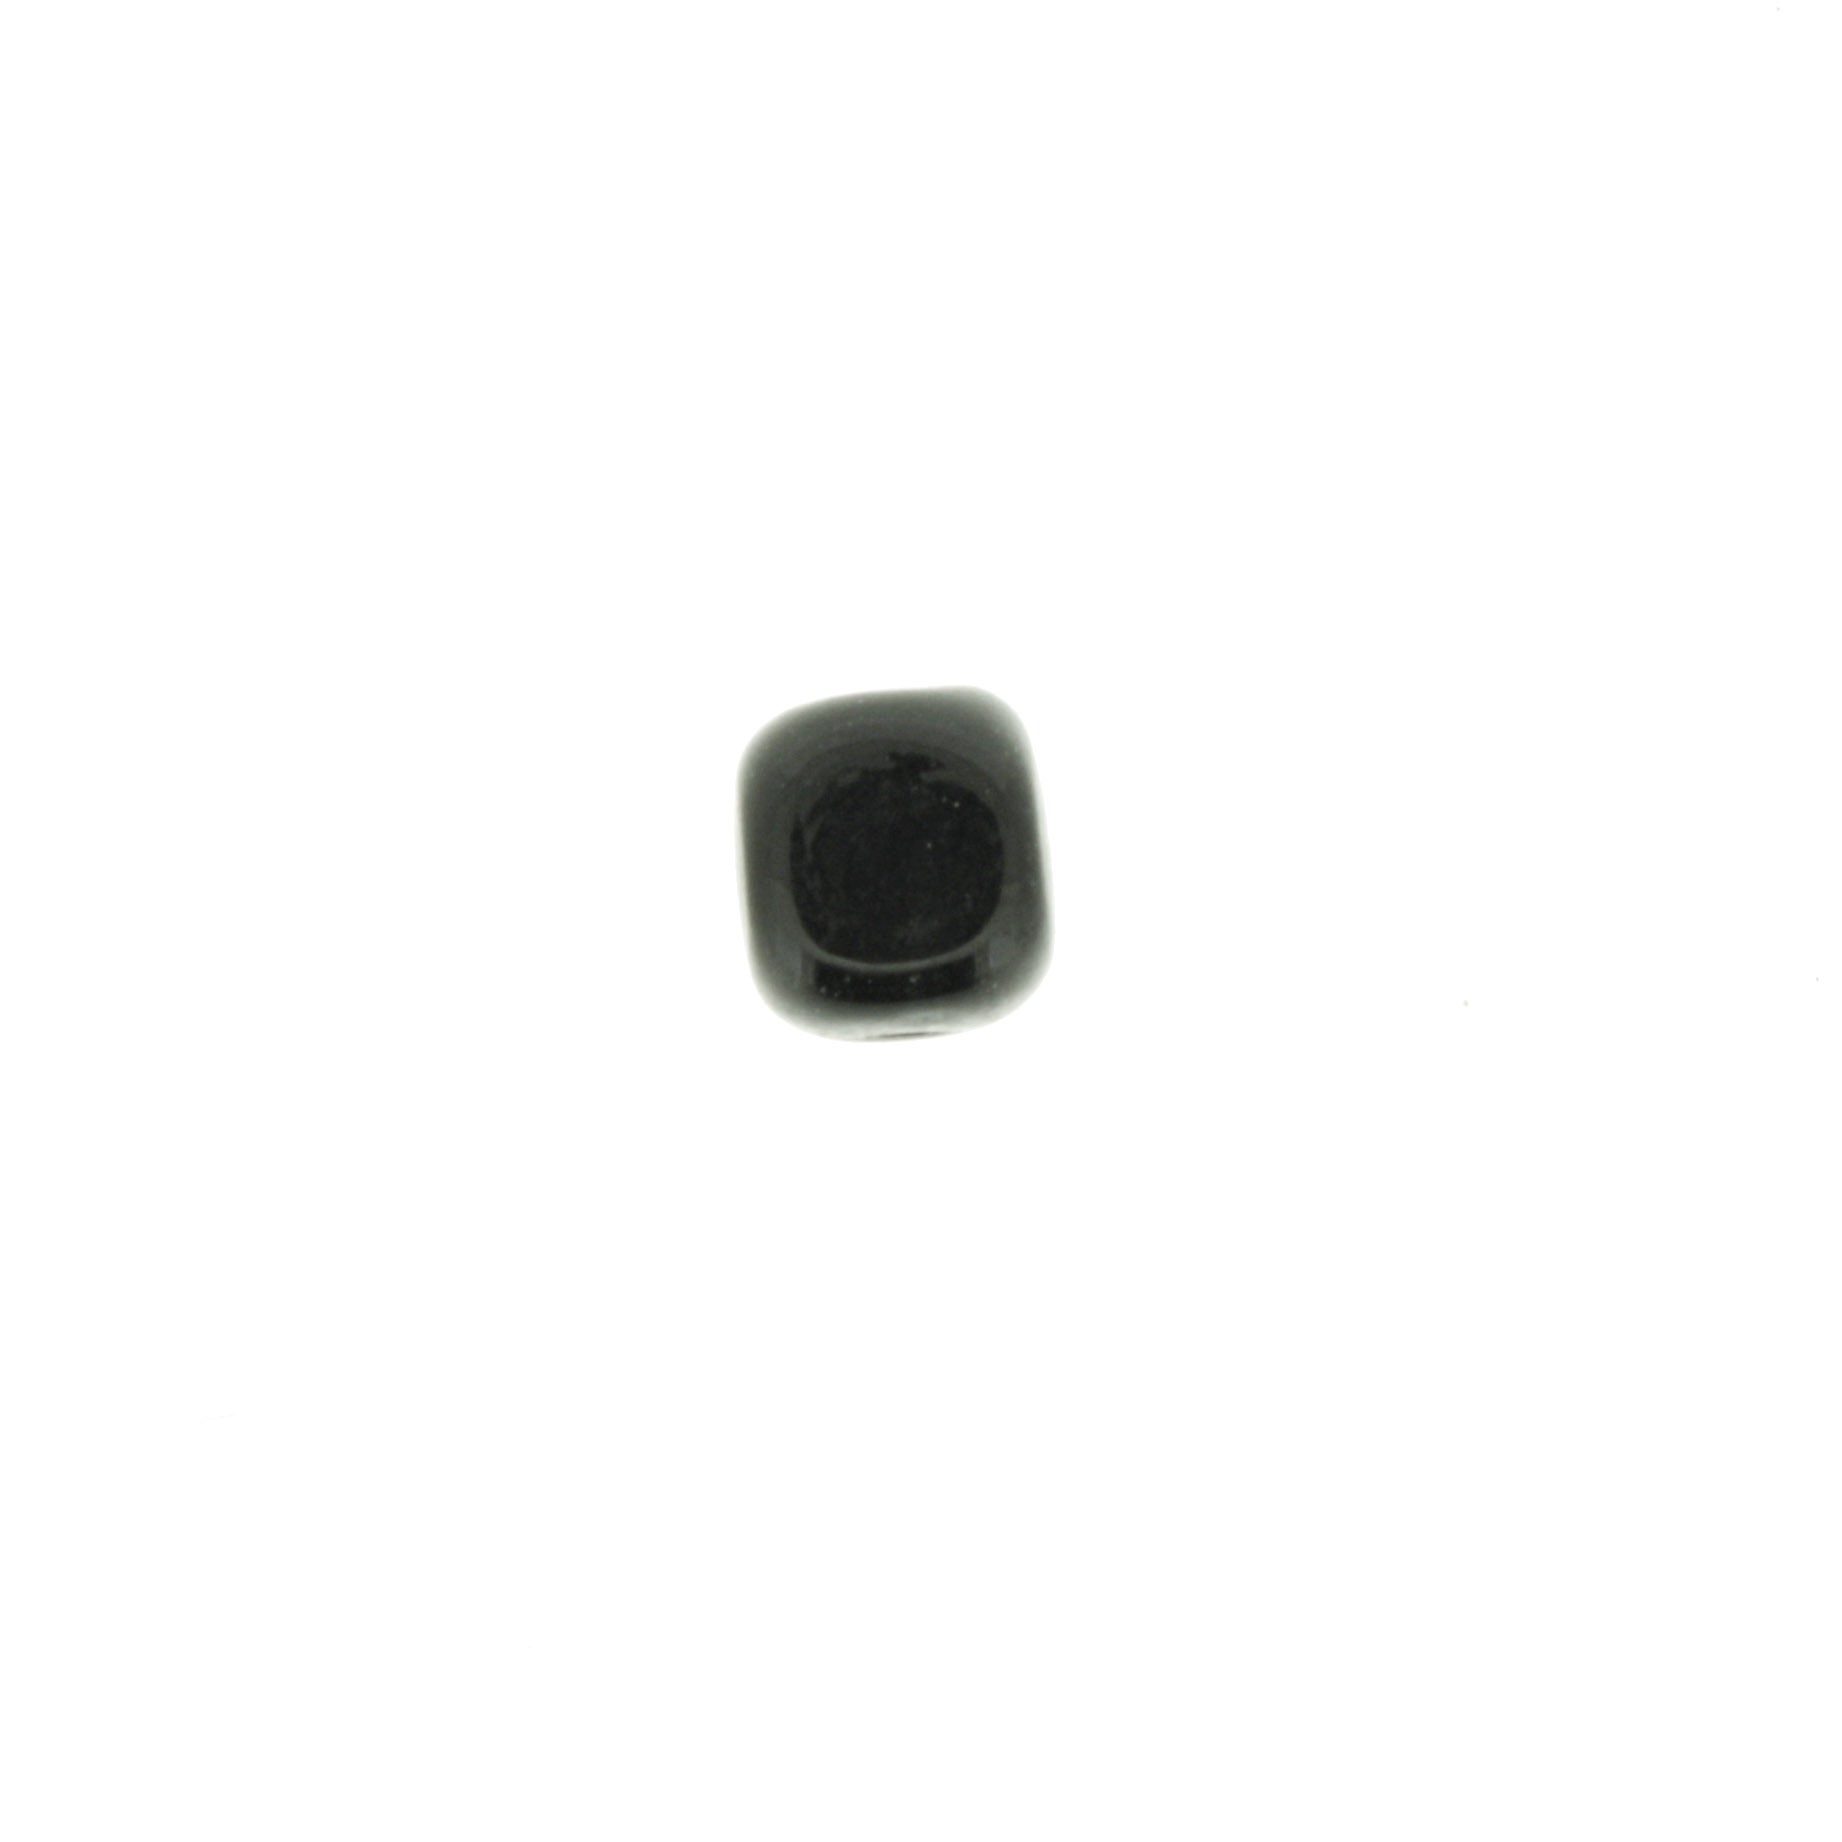 Cubo Vidro - Preto - Ref.: MC725  - Stéphanie Bijoux® - Peças para Bijuterias e Artesanato